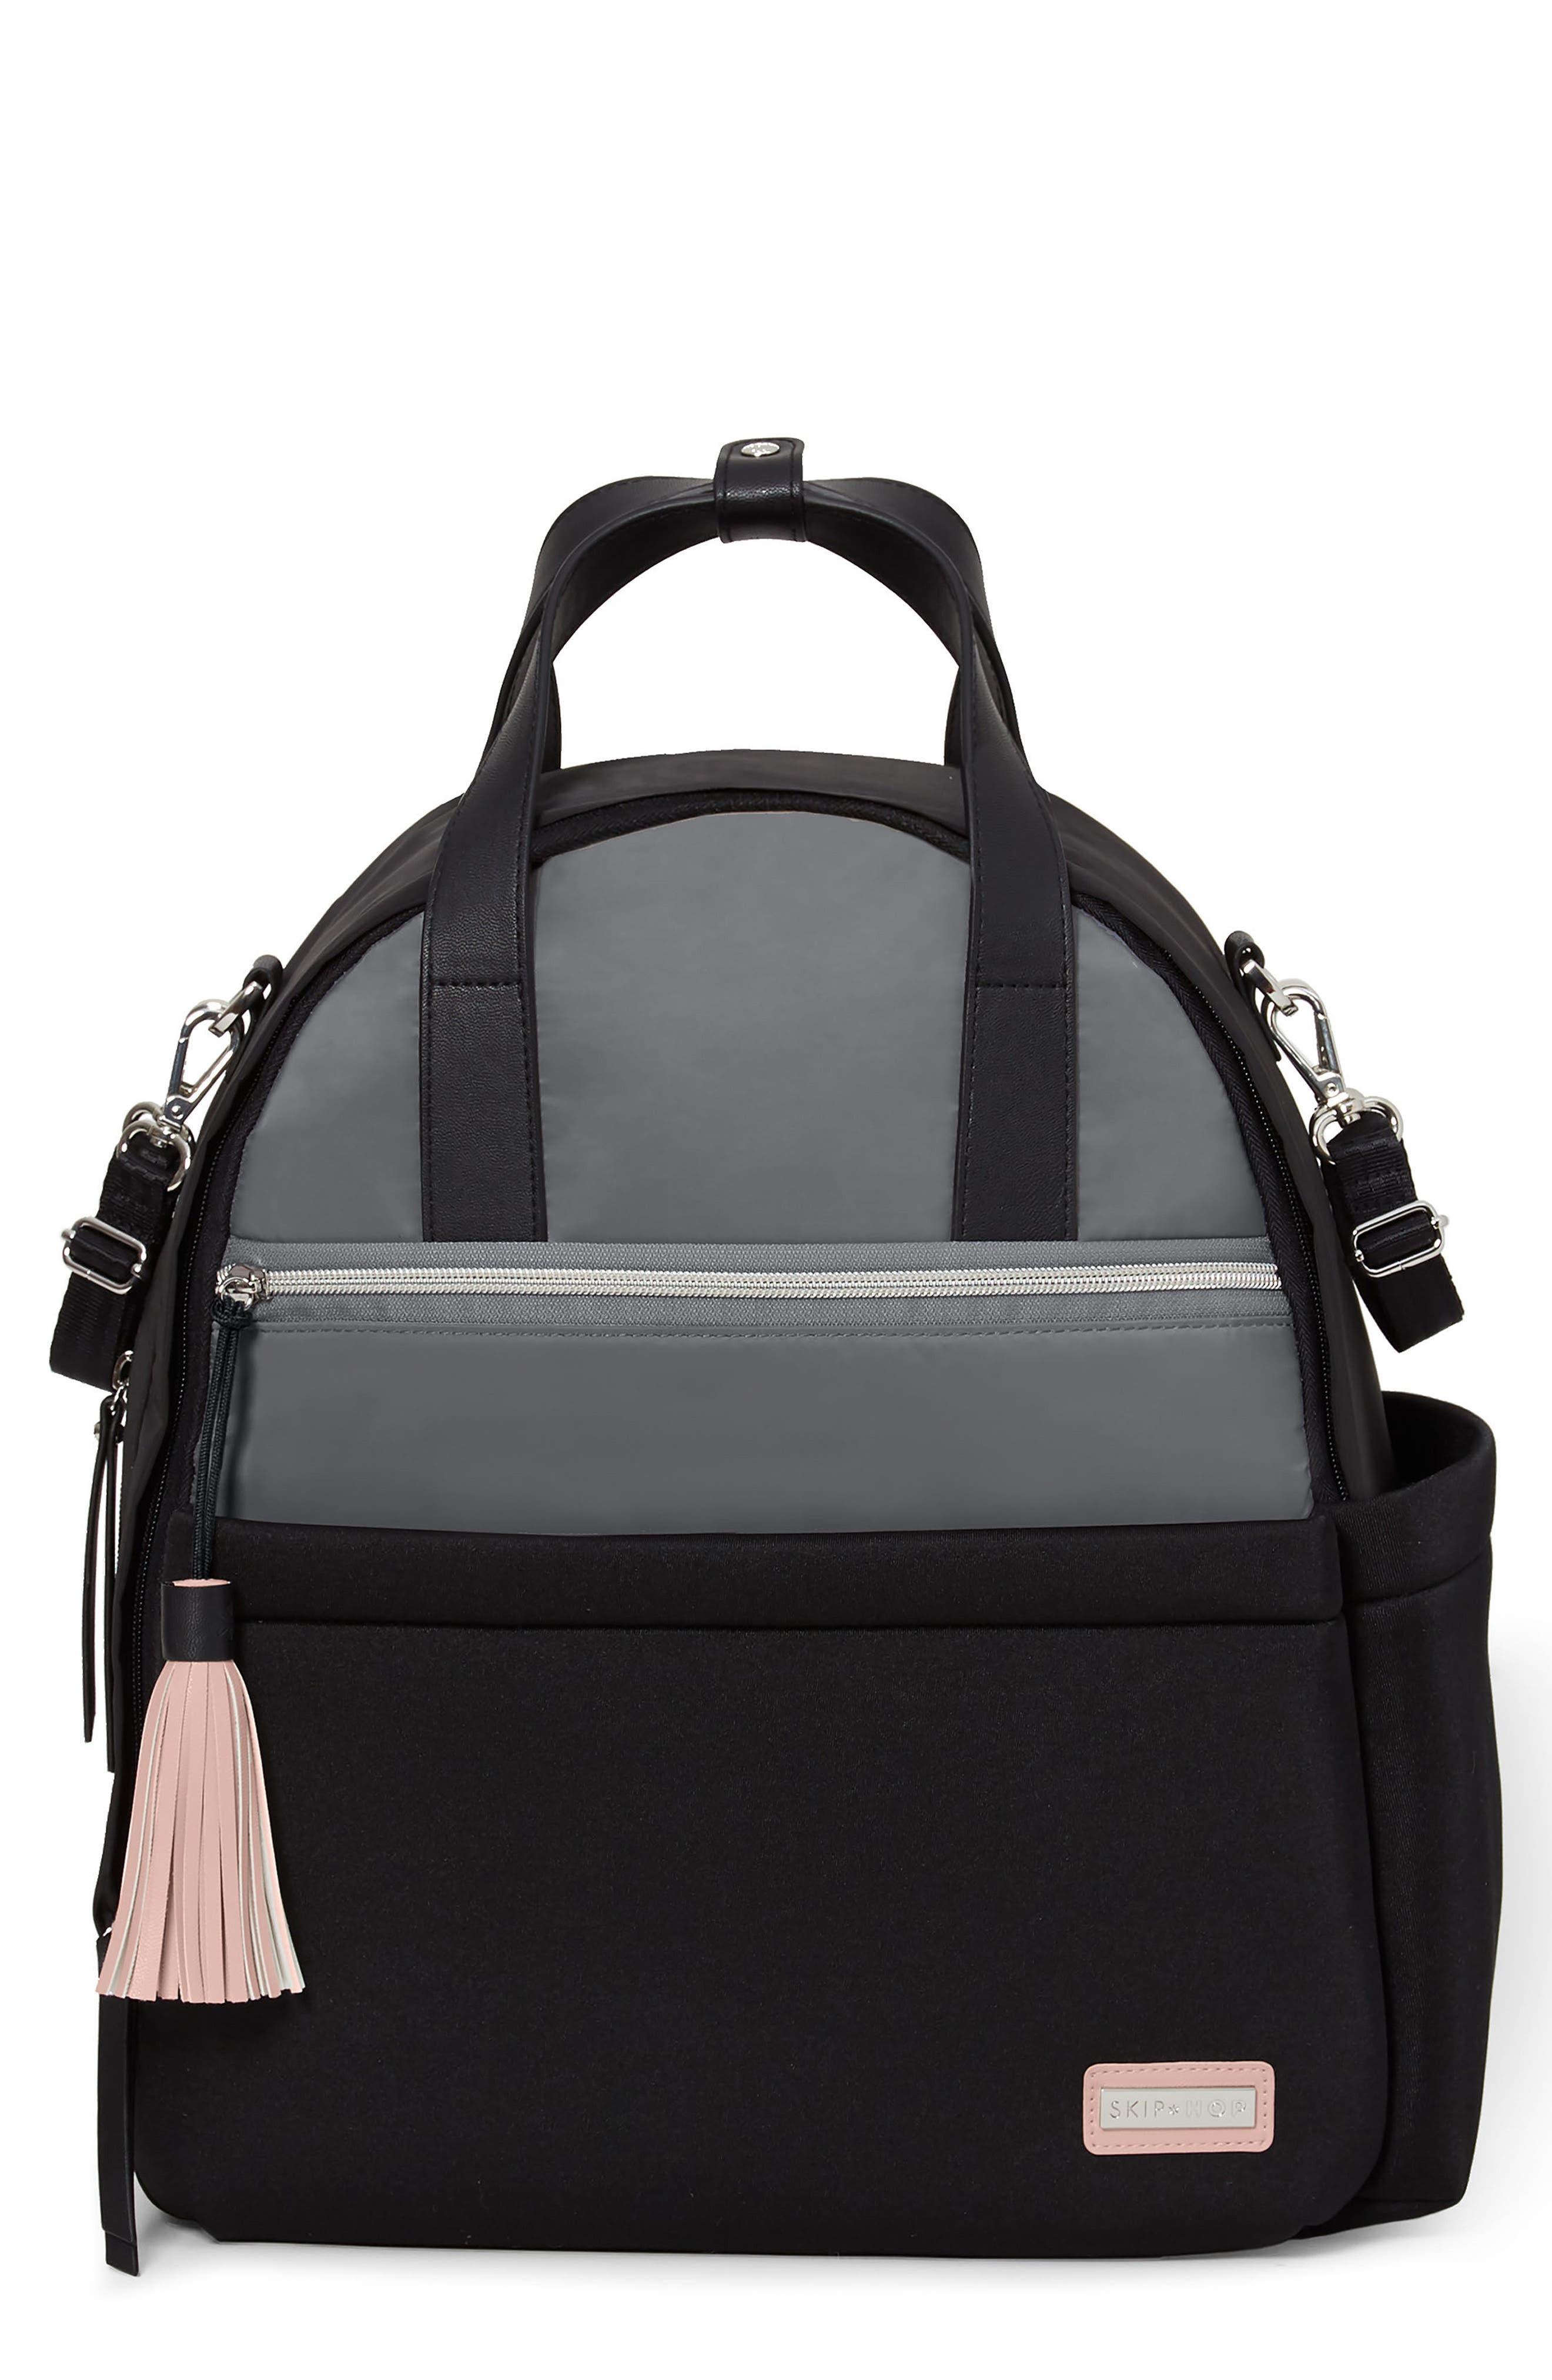 Skip Hop Nolita Neoprene Diaper Backpack